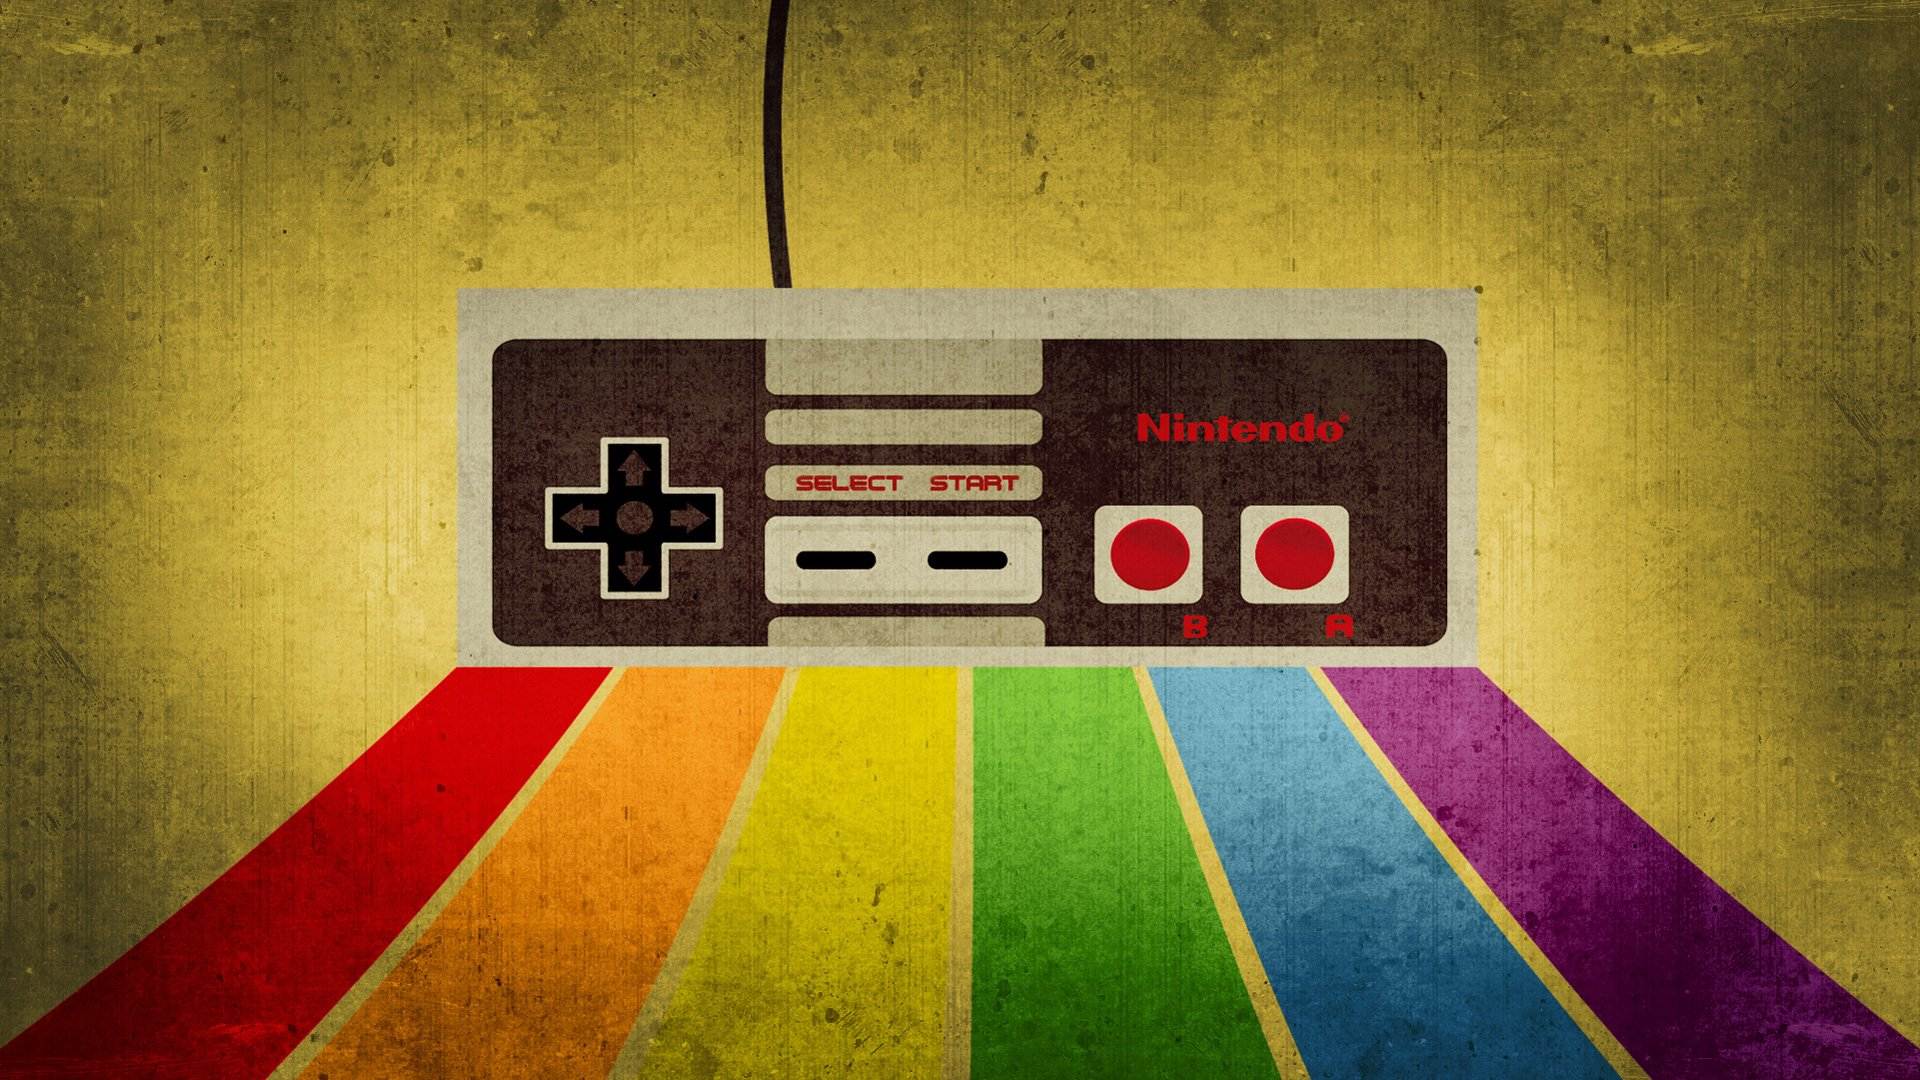 Retro Gaming wallpaper photo